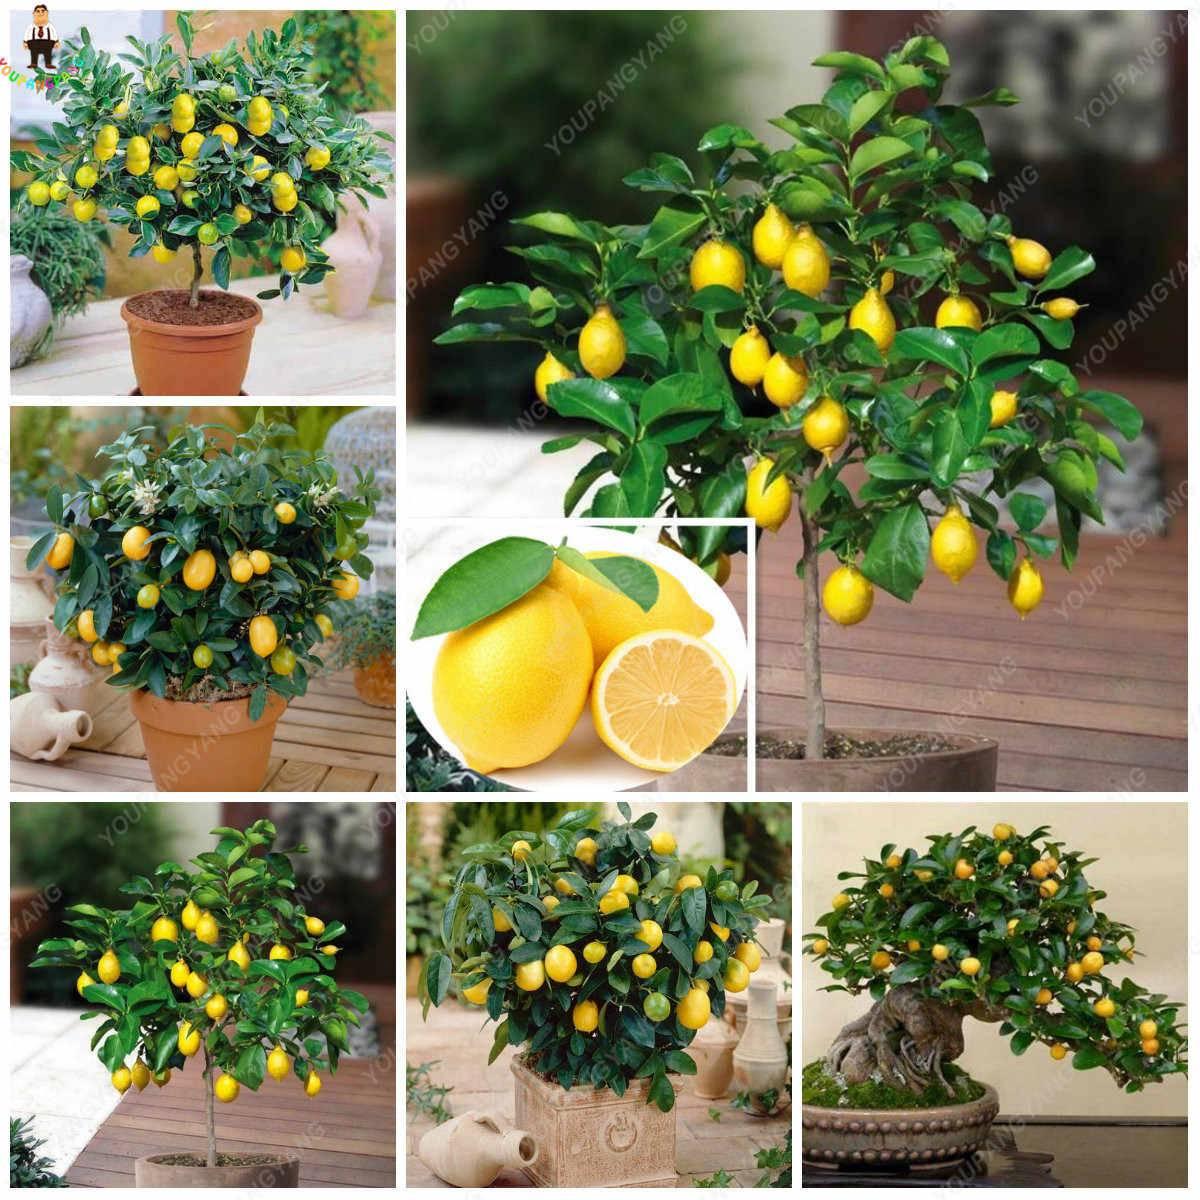 Лимон пандероза: описание сорта и уход в домашних условиях